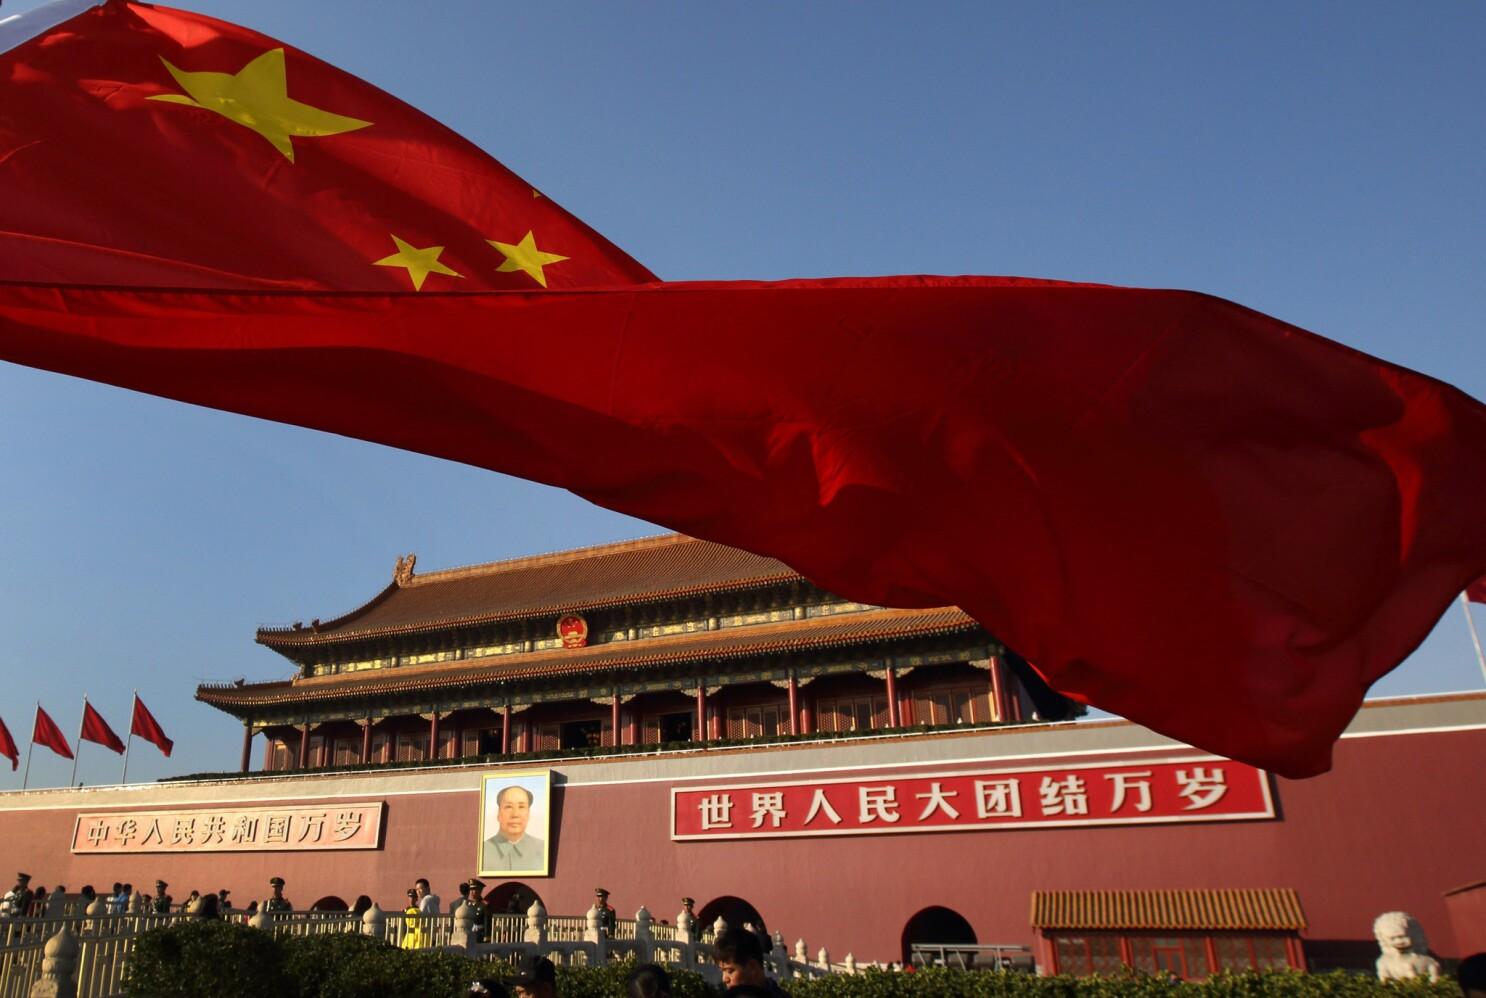 Americans' attitudes toward China plunge, thanks to Trump